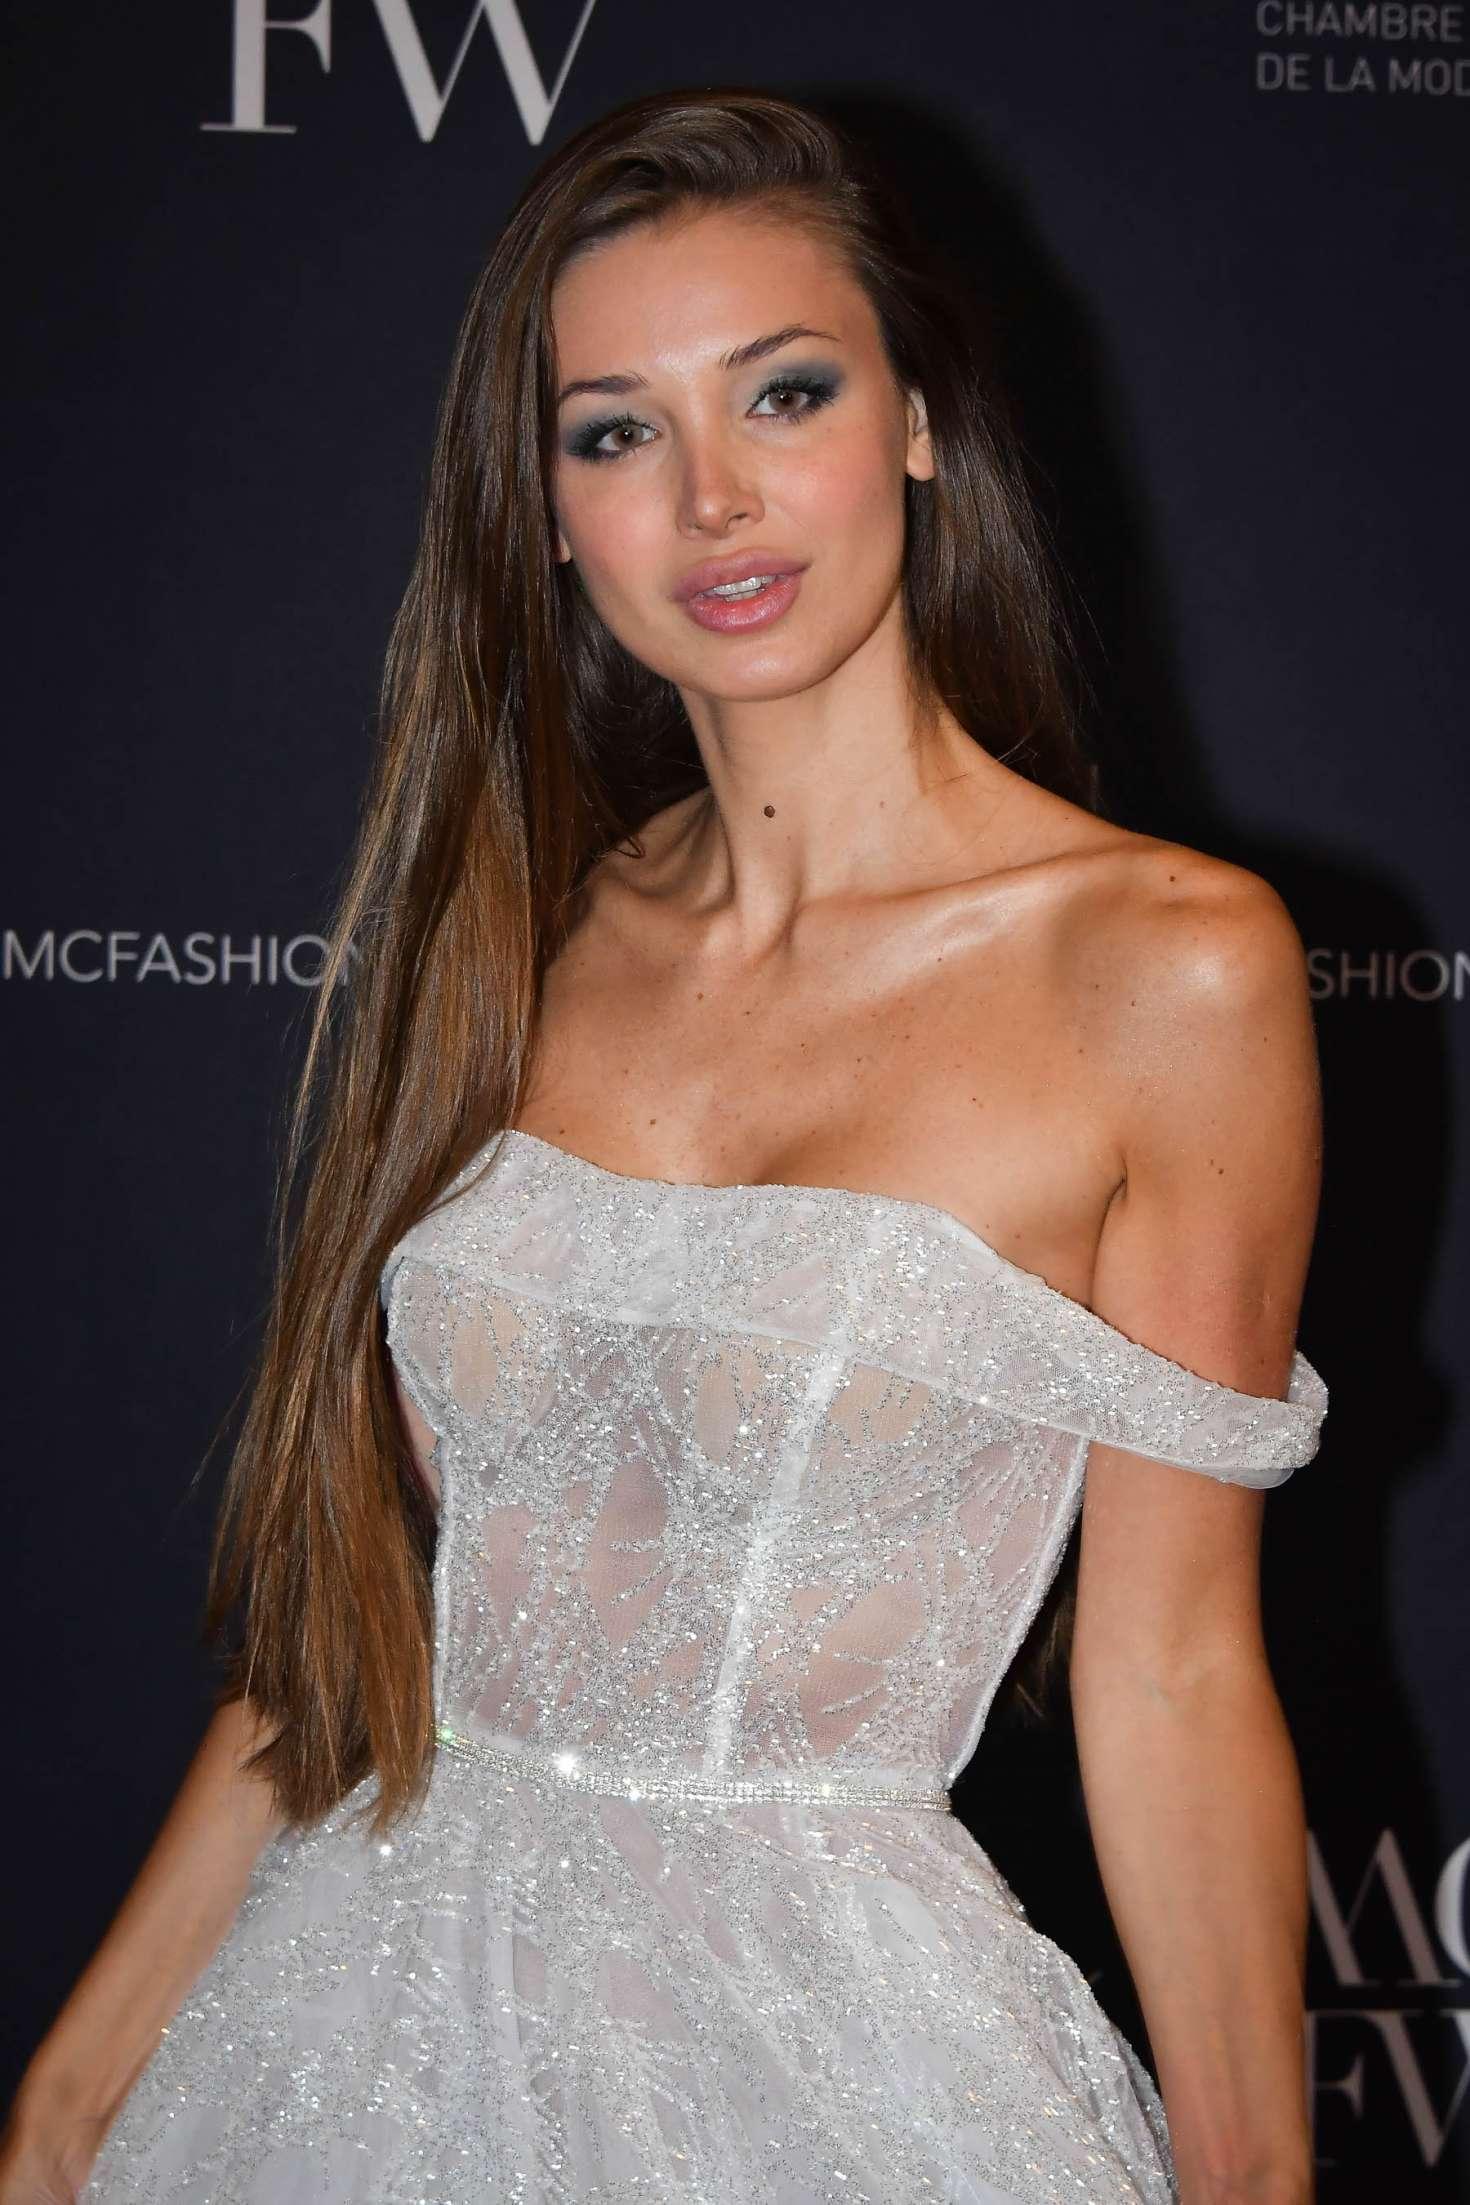 Lara Lieto At Monte Carlo Fashion Week Gala And Awards